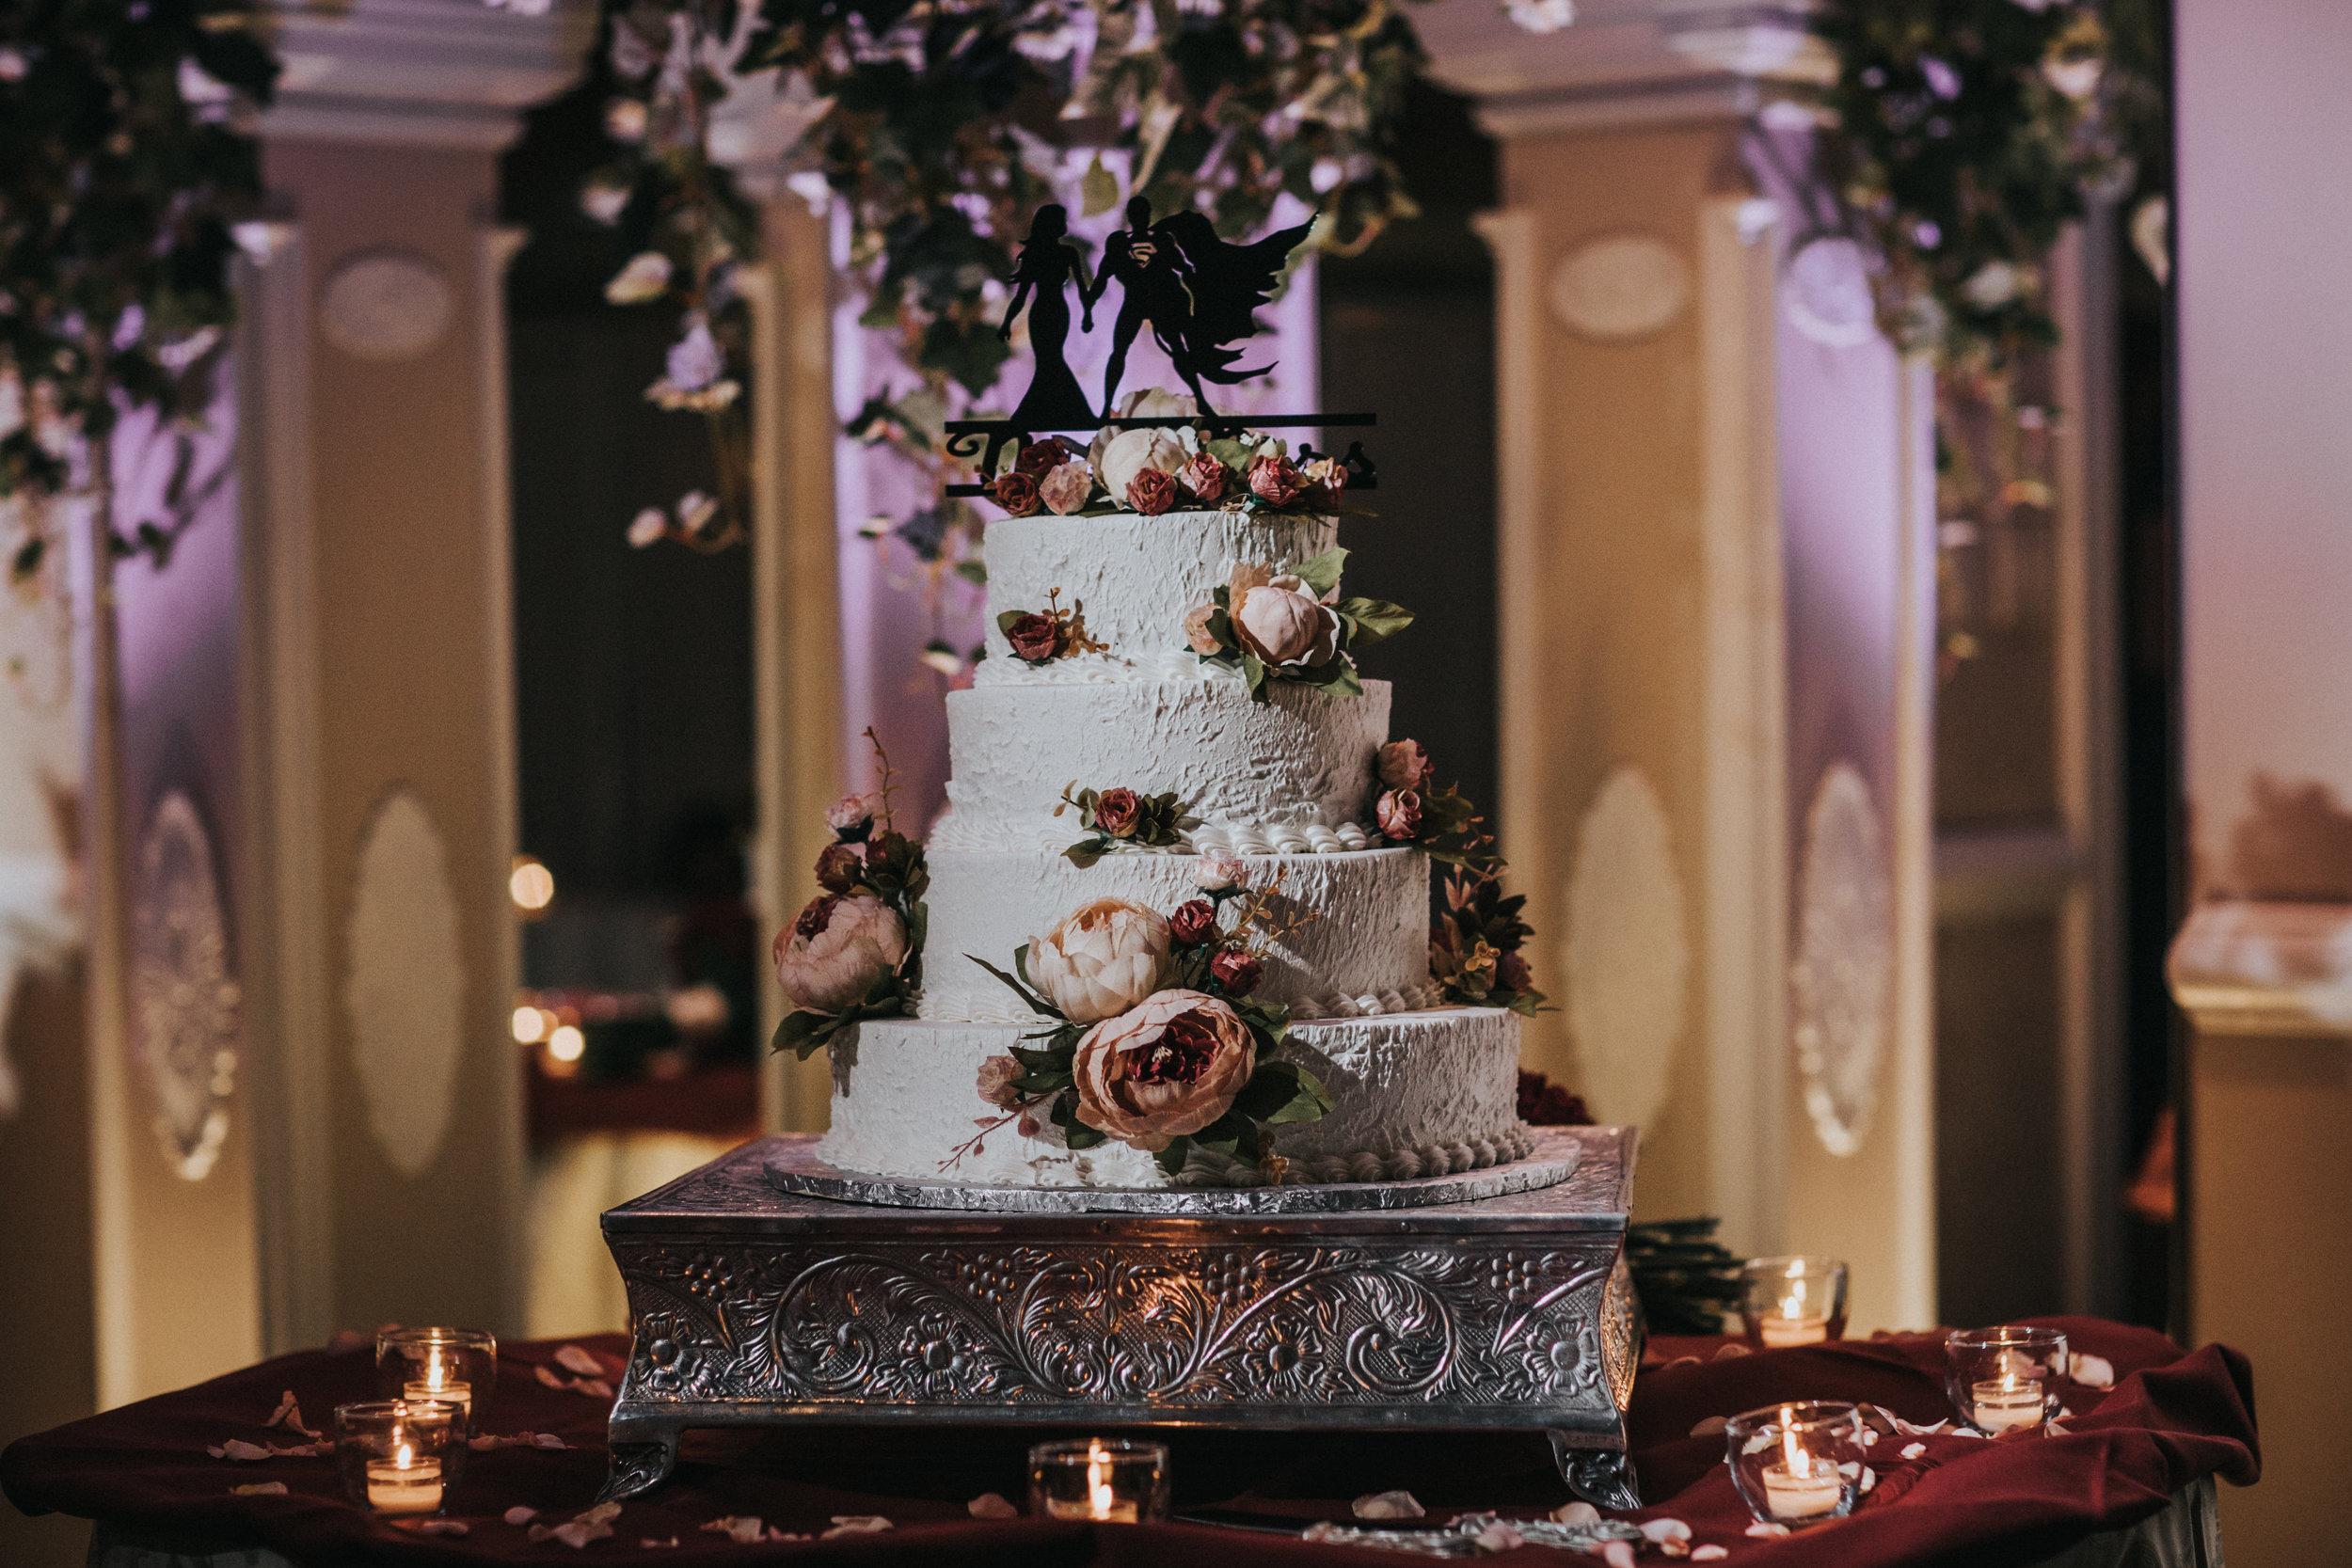 New-Jersey-Wedding-Photographer-ReceptionCenter-Valeria&Mike-Venue_Details (15 of 21).jpg